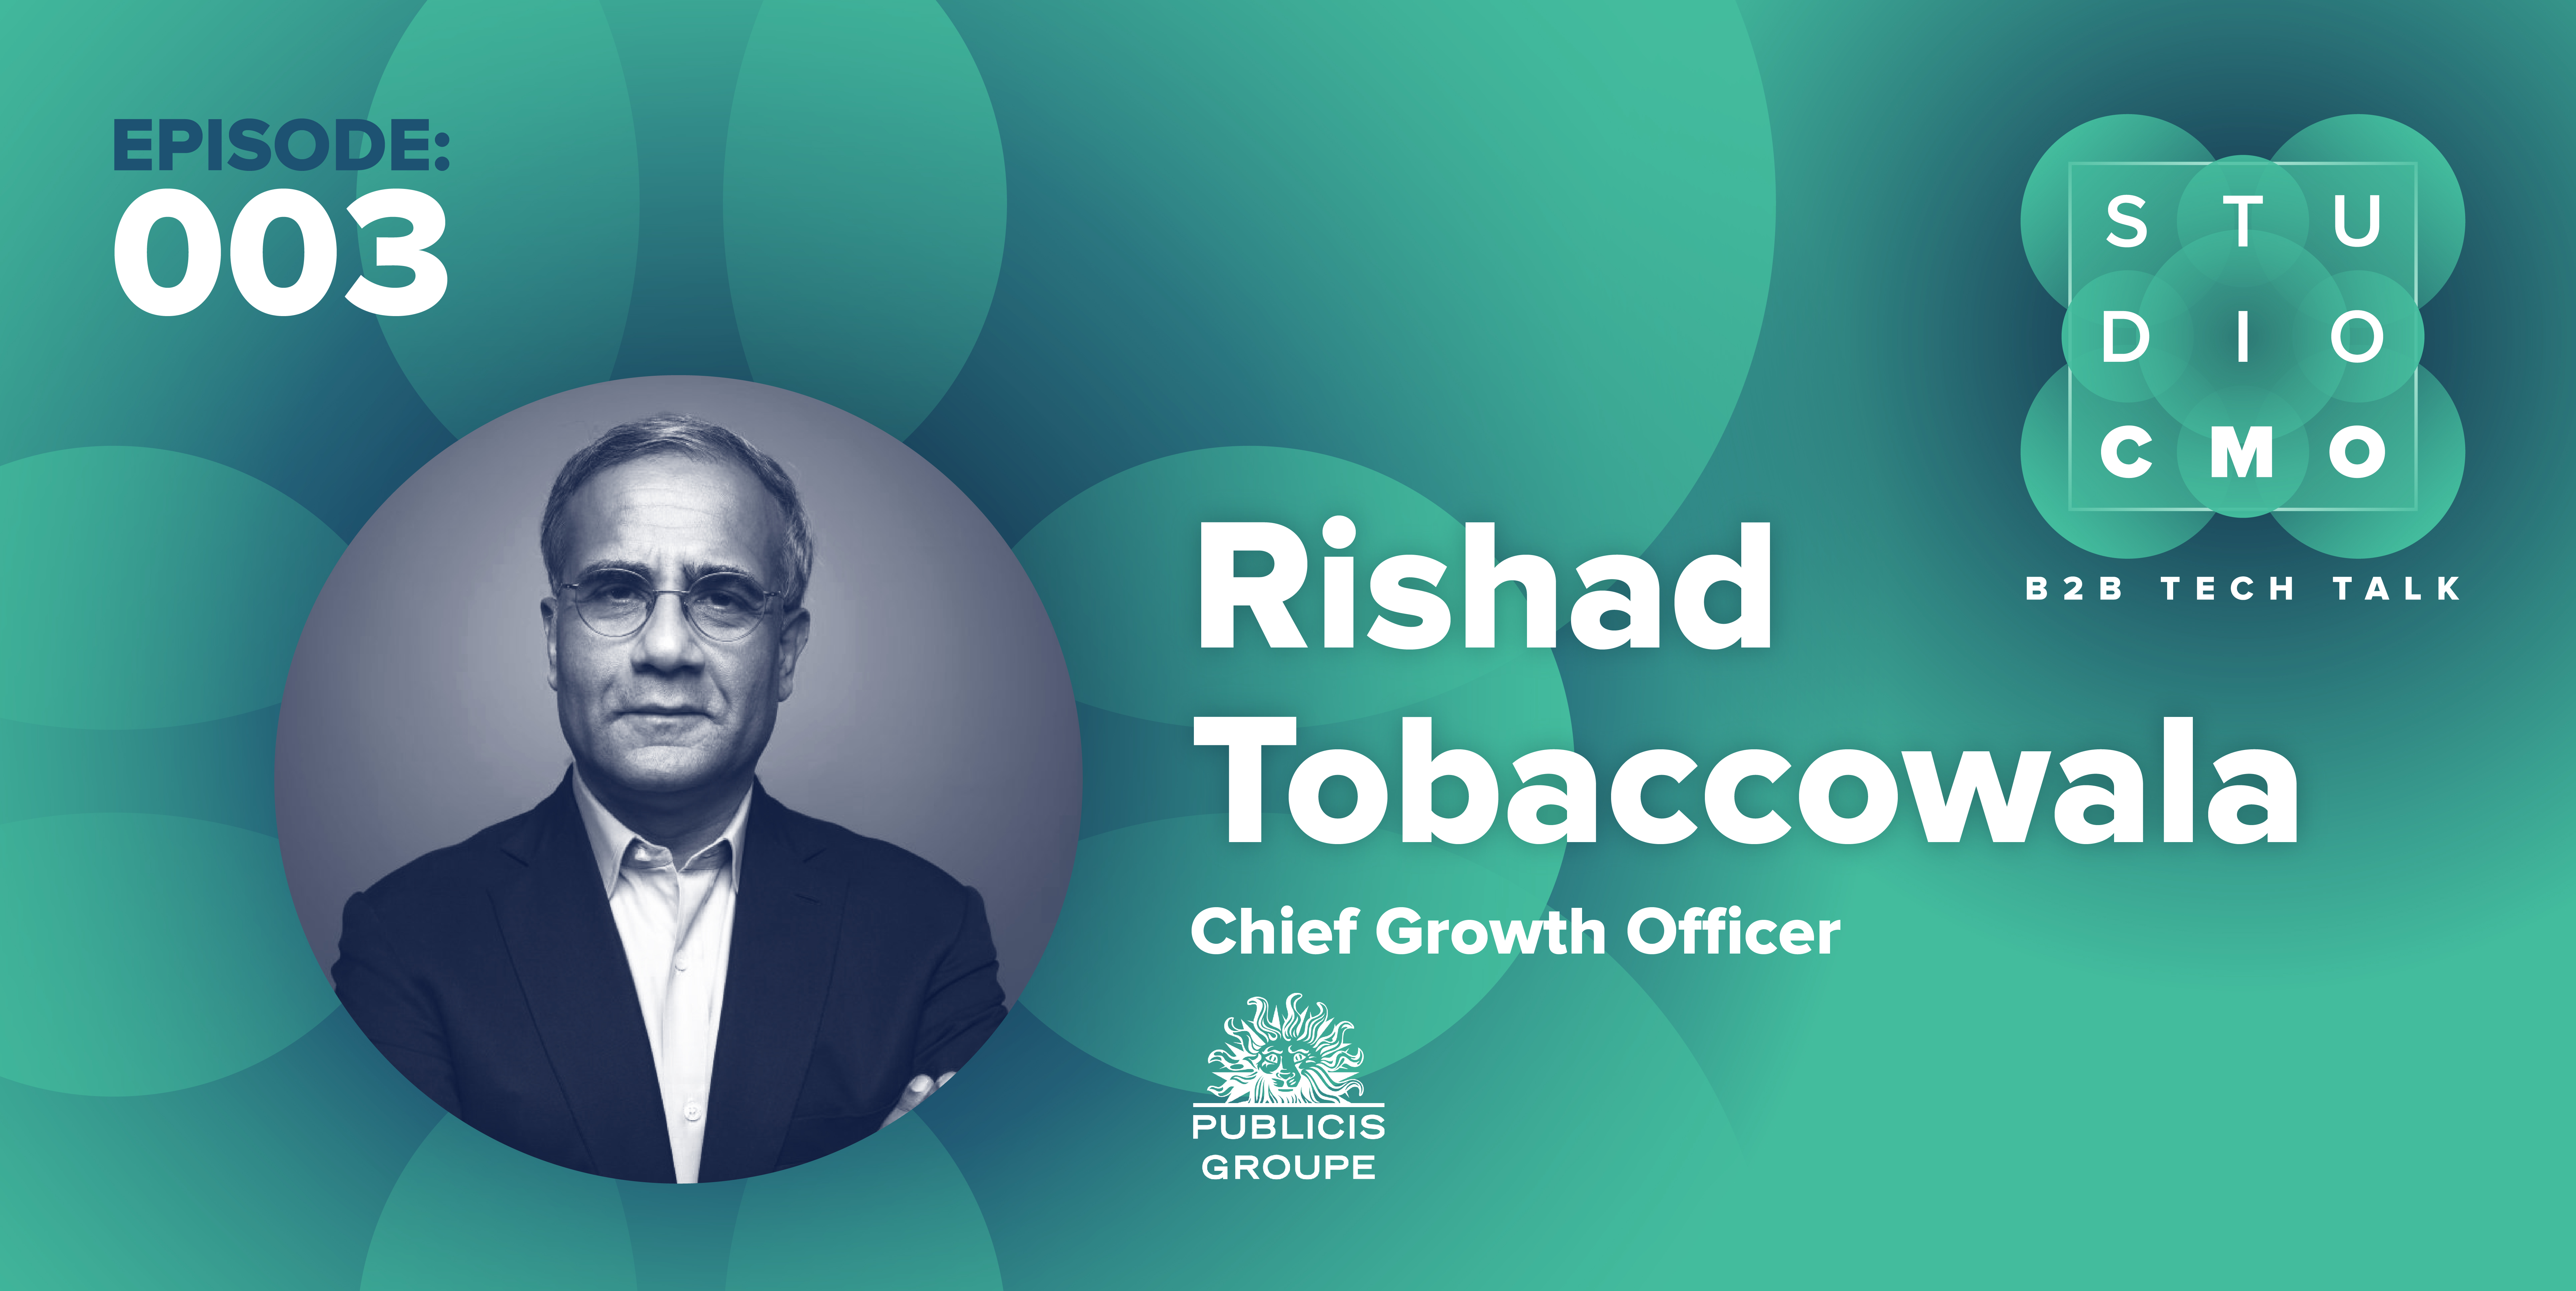 Rishad tobaccowala marketing podcast